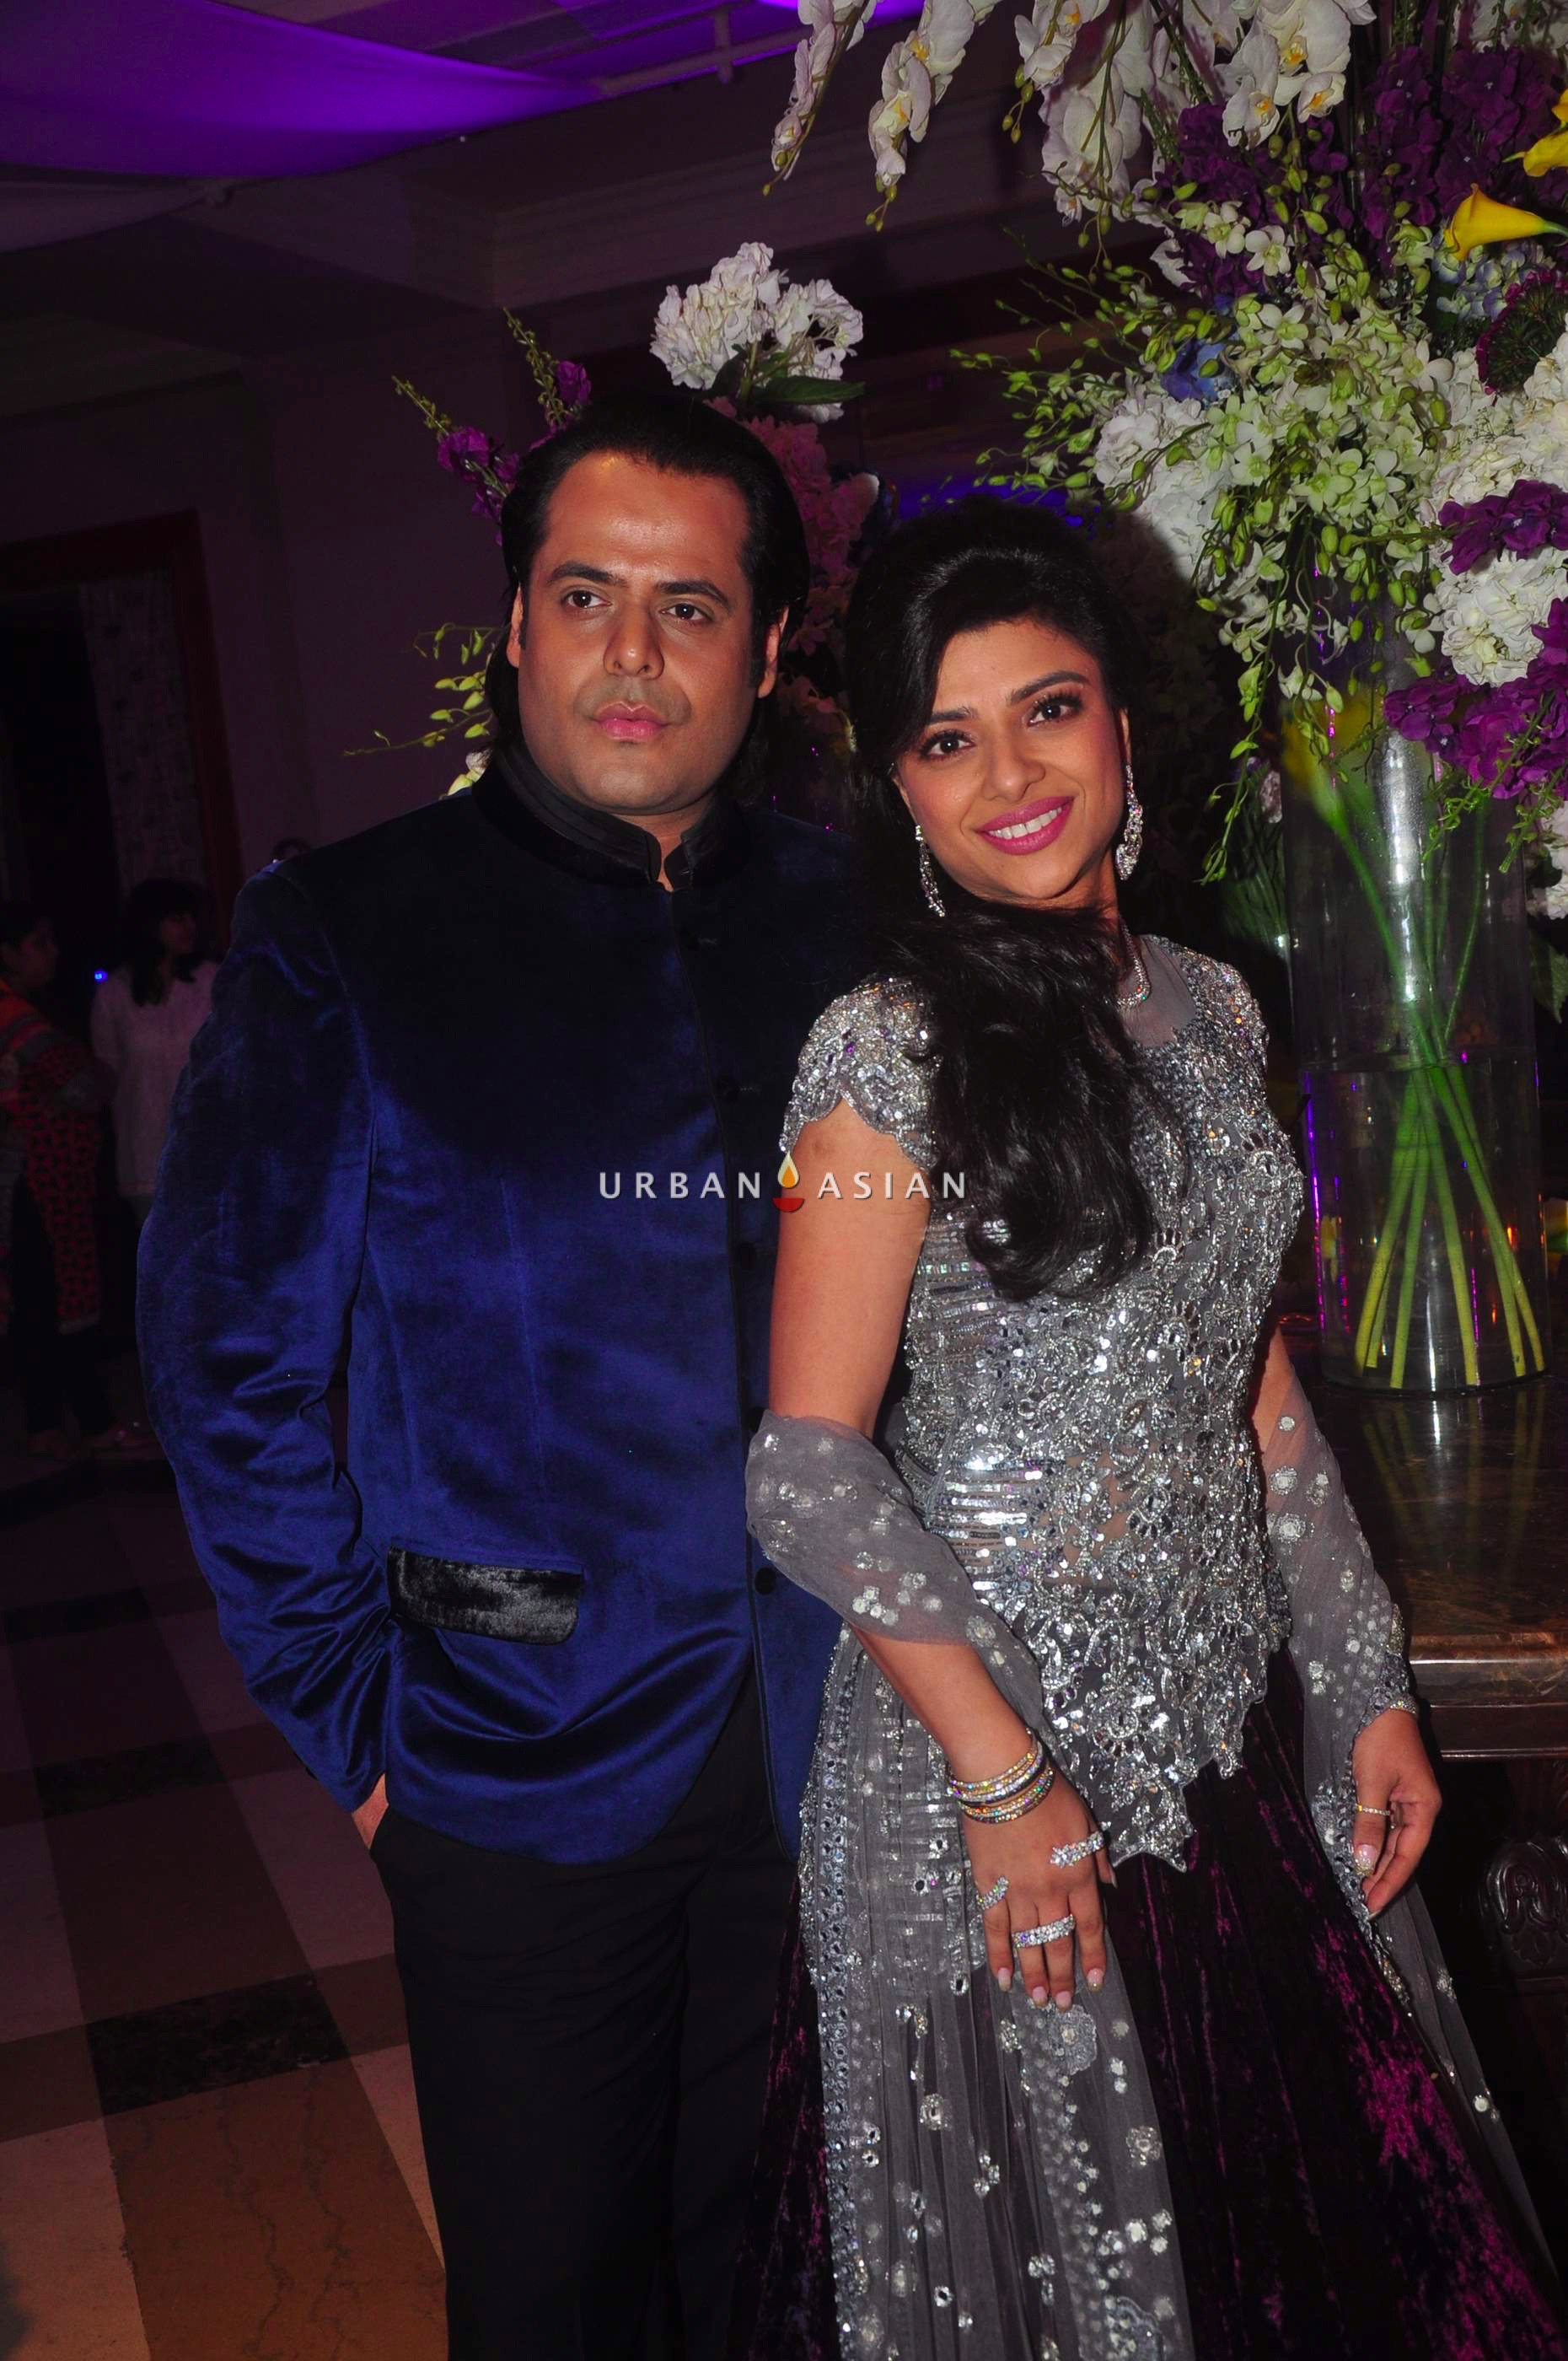 Uday Singh and Shirin3